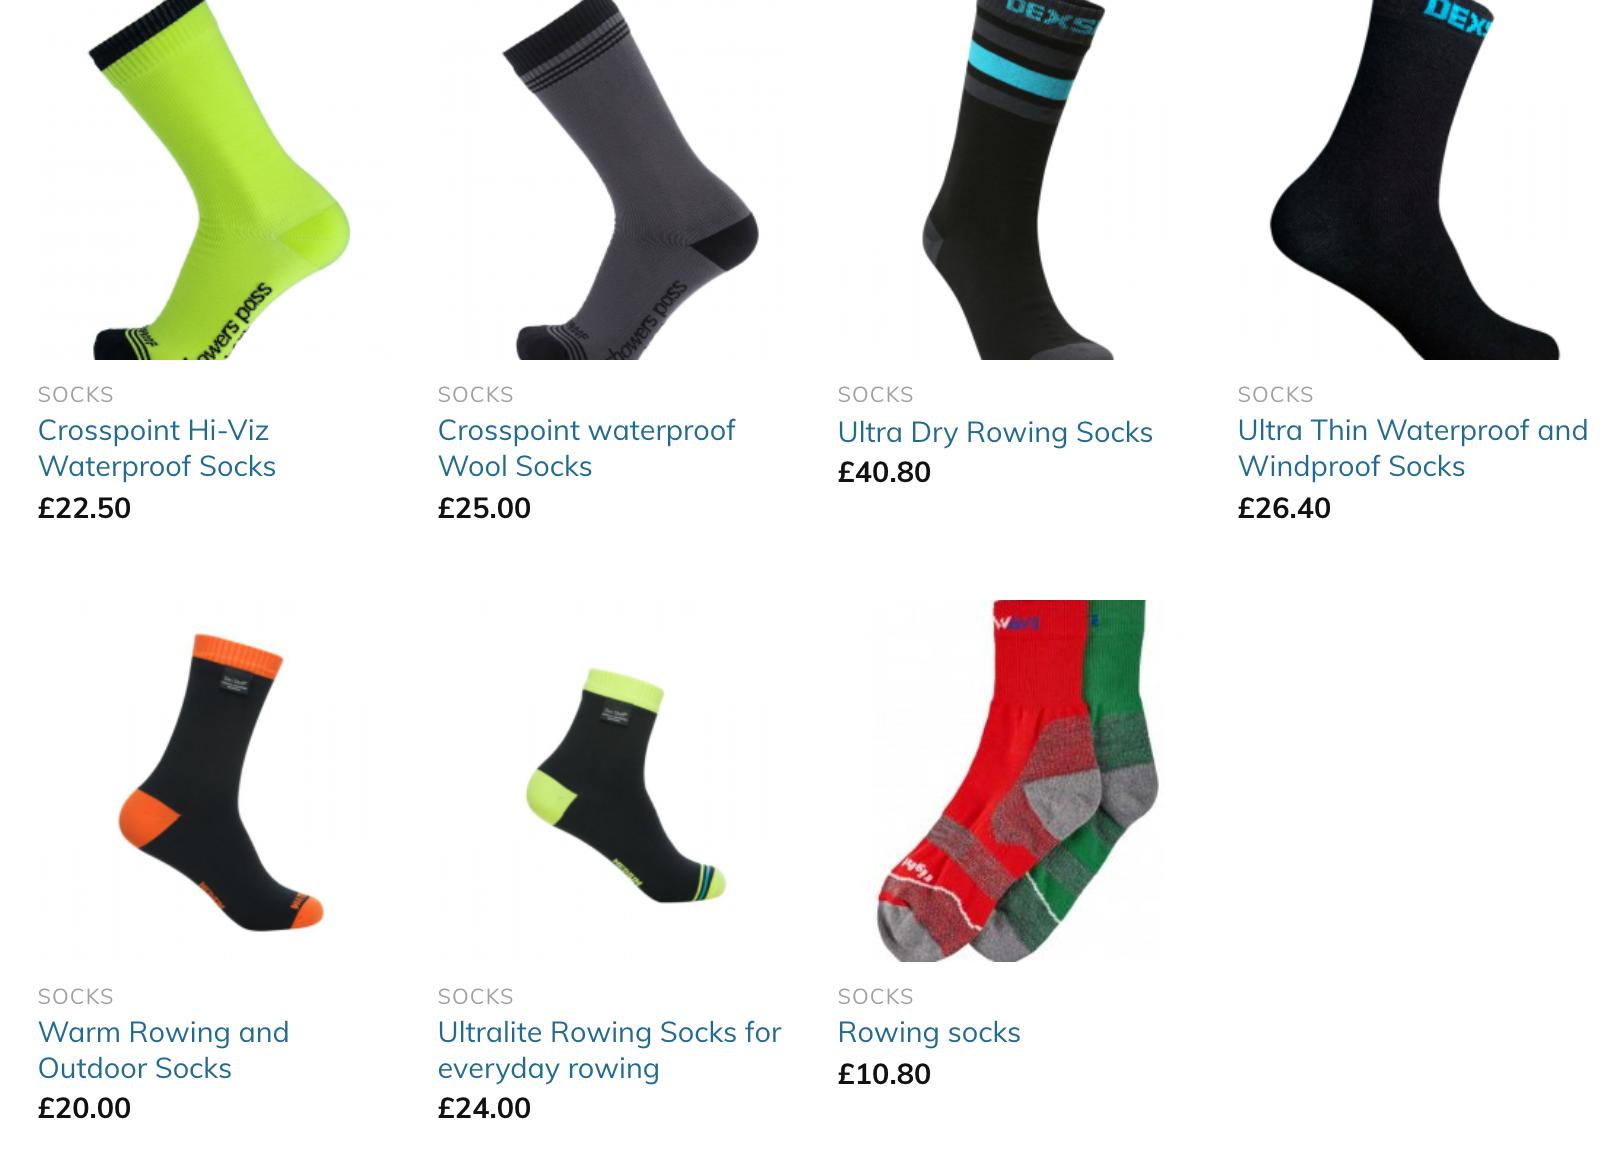 rowing socks, waterproof socks, watersport socks, warm feet winter,